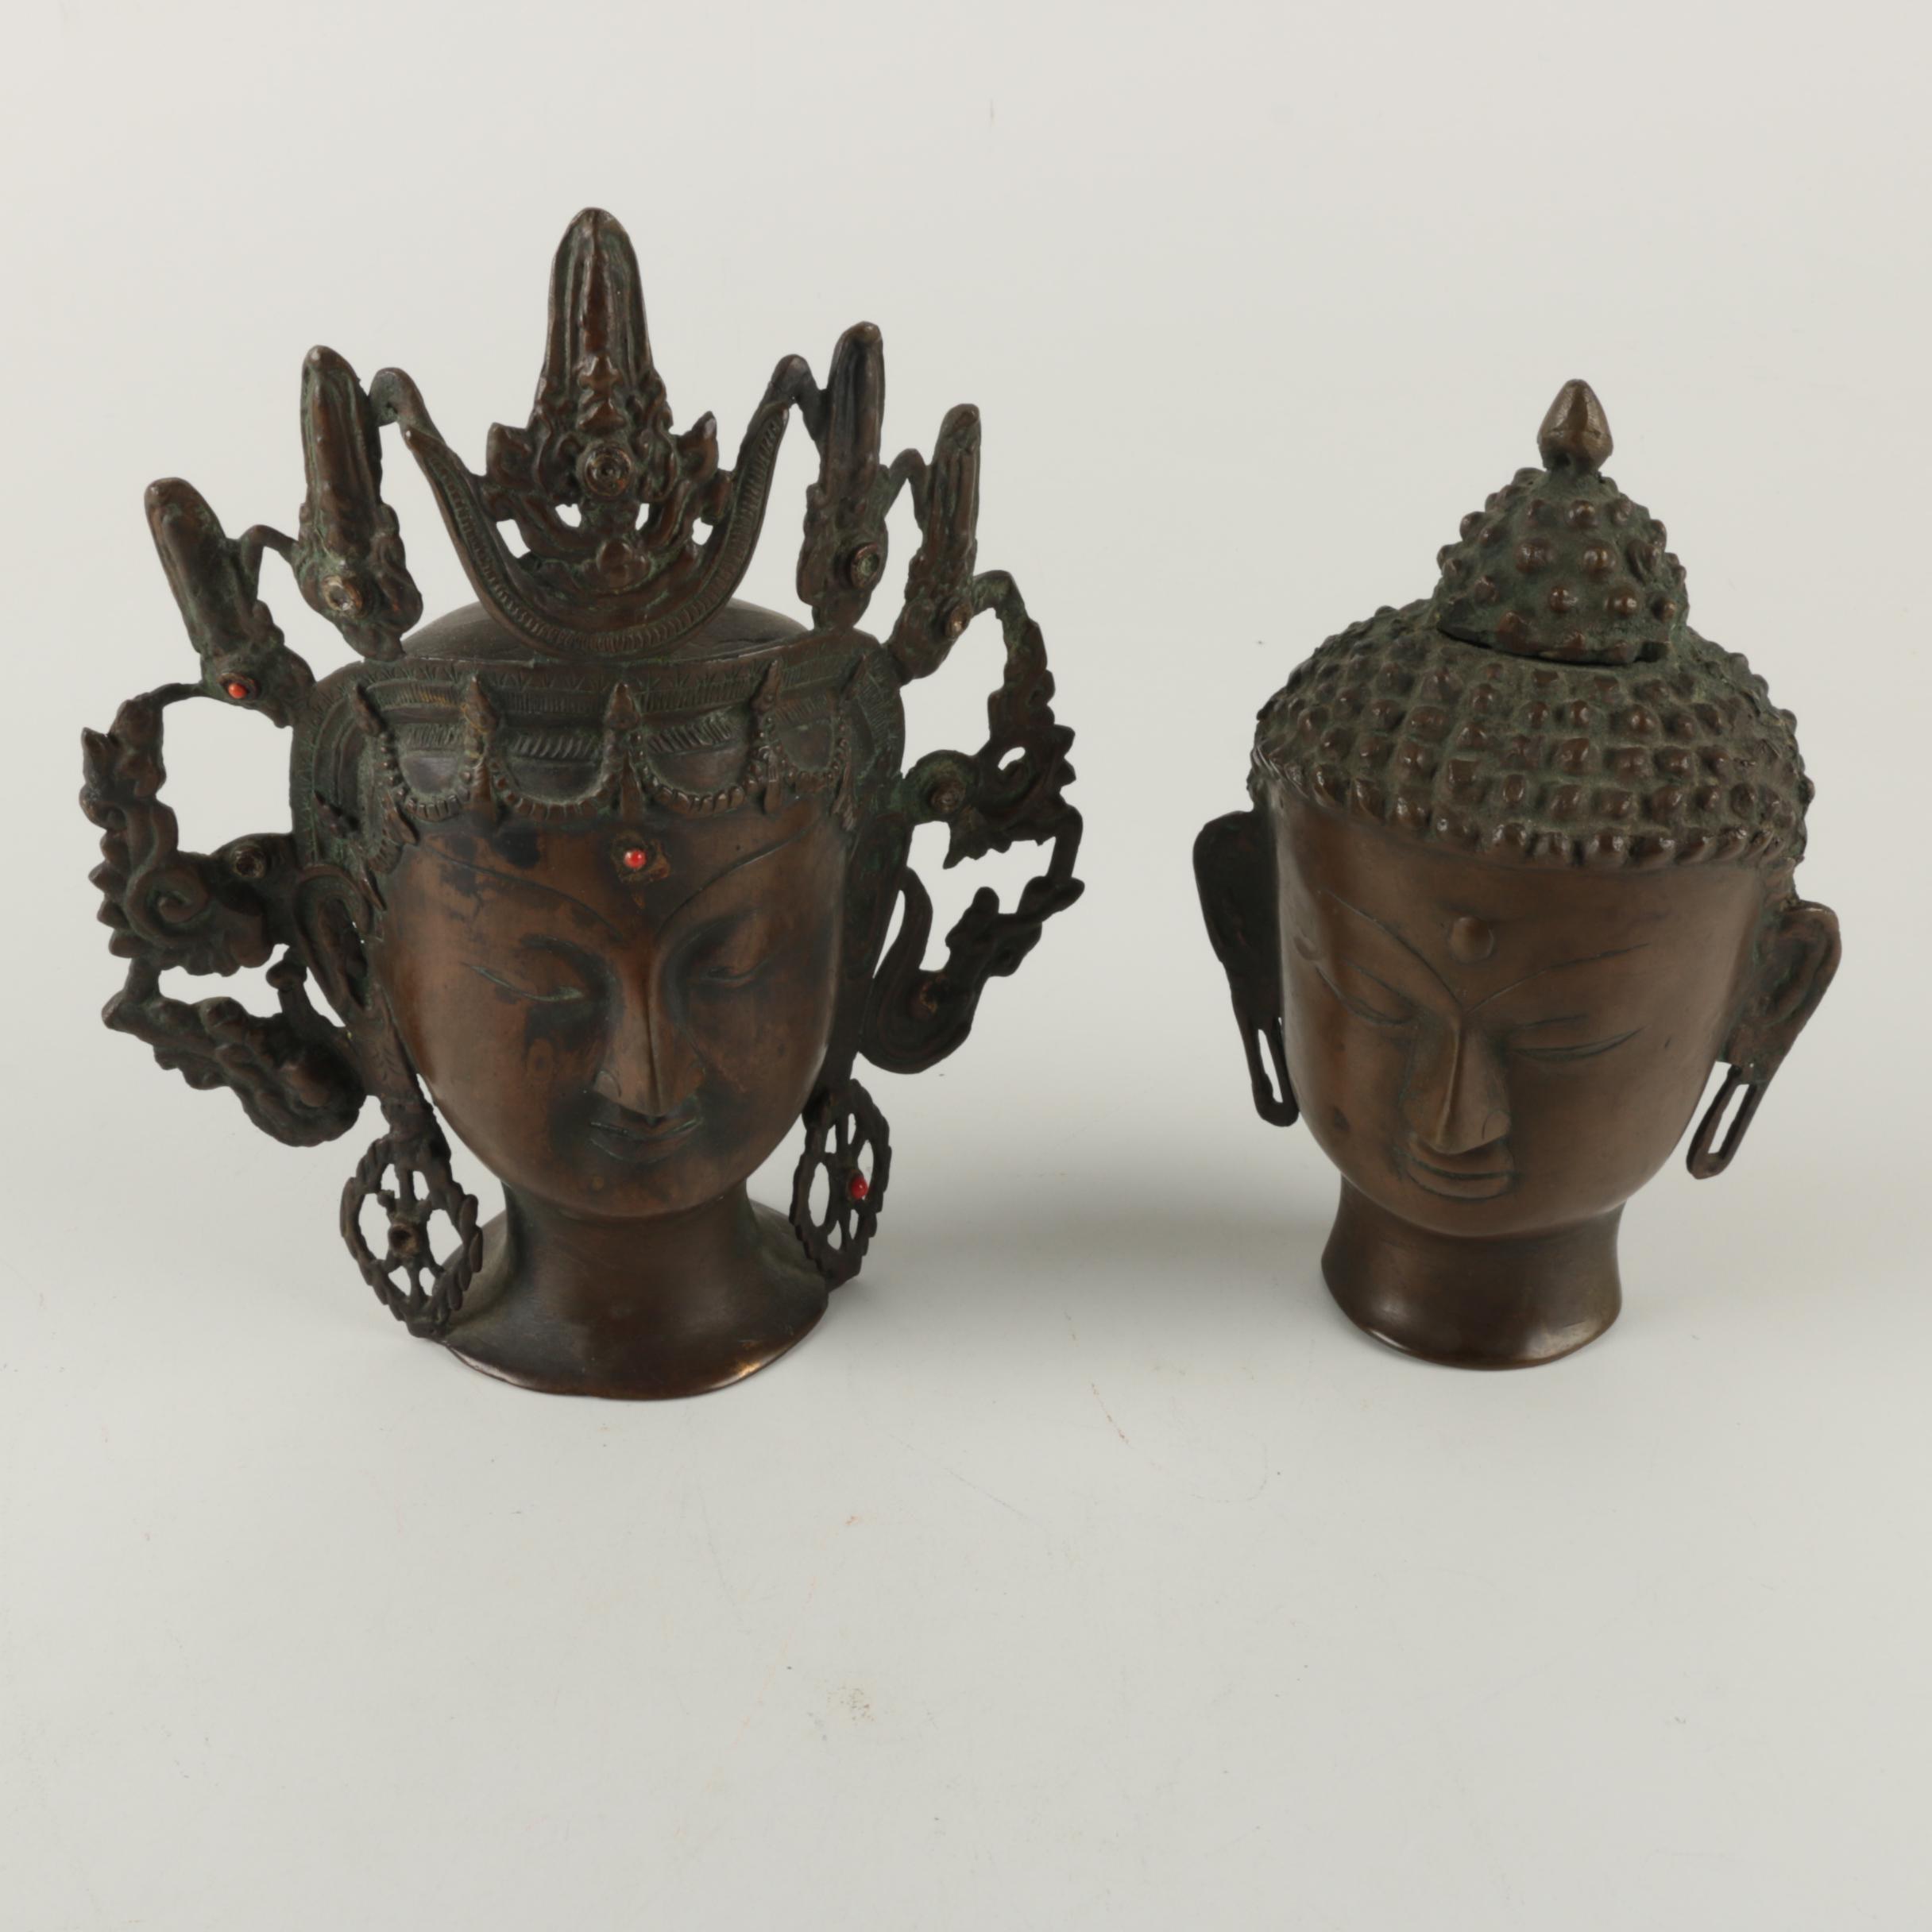 Thai Bronze Buddha Head and Female Deity Figurines